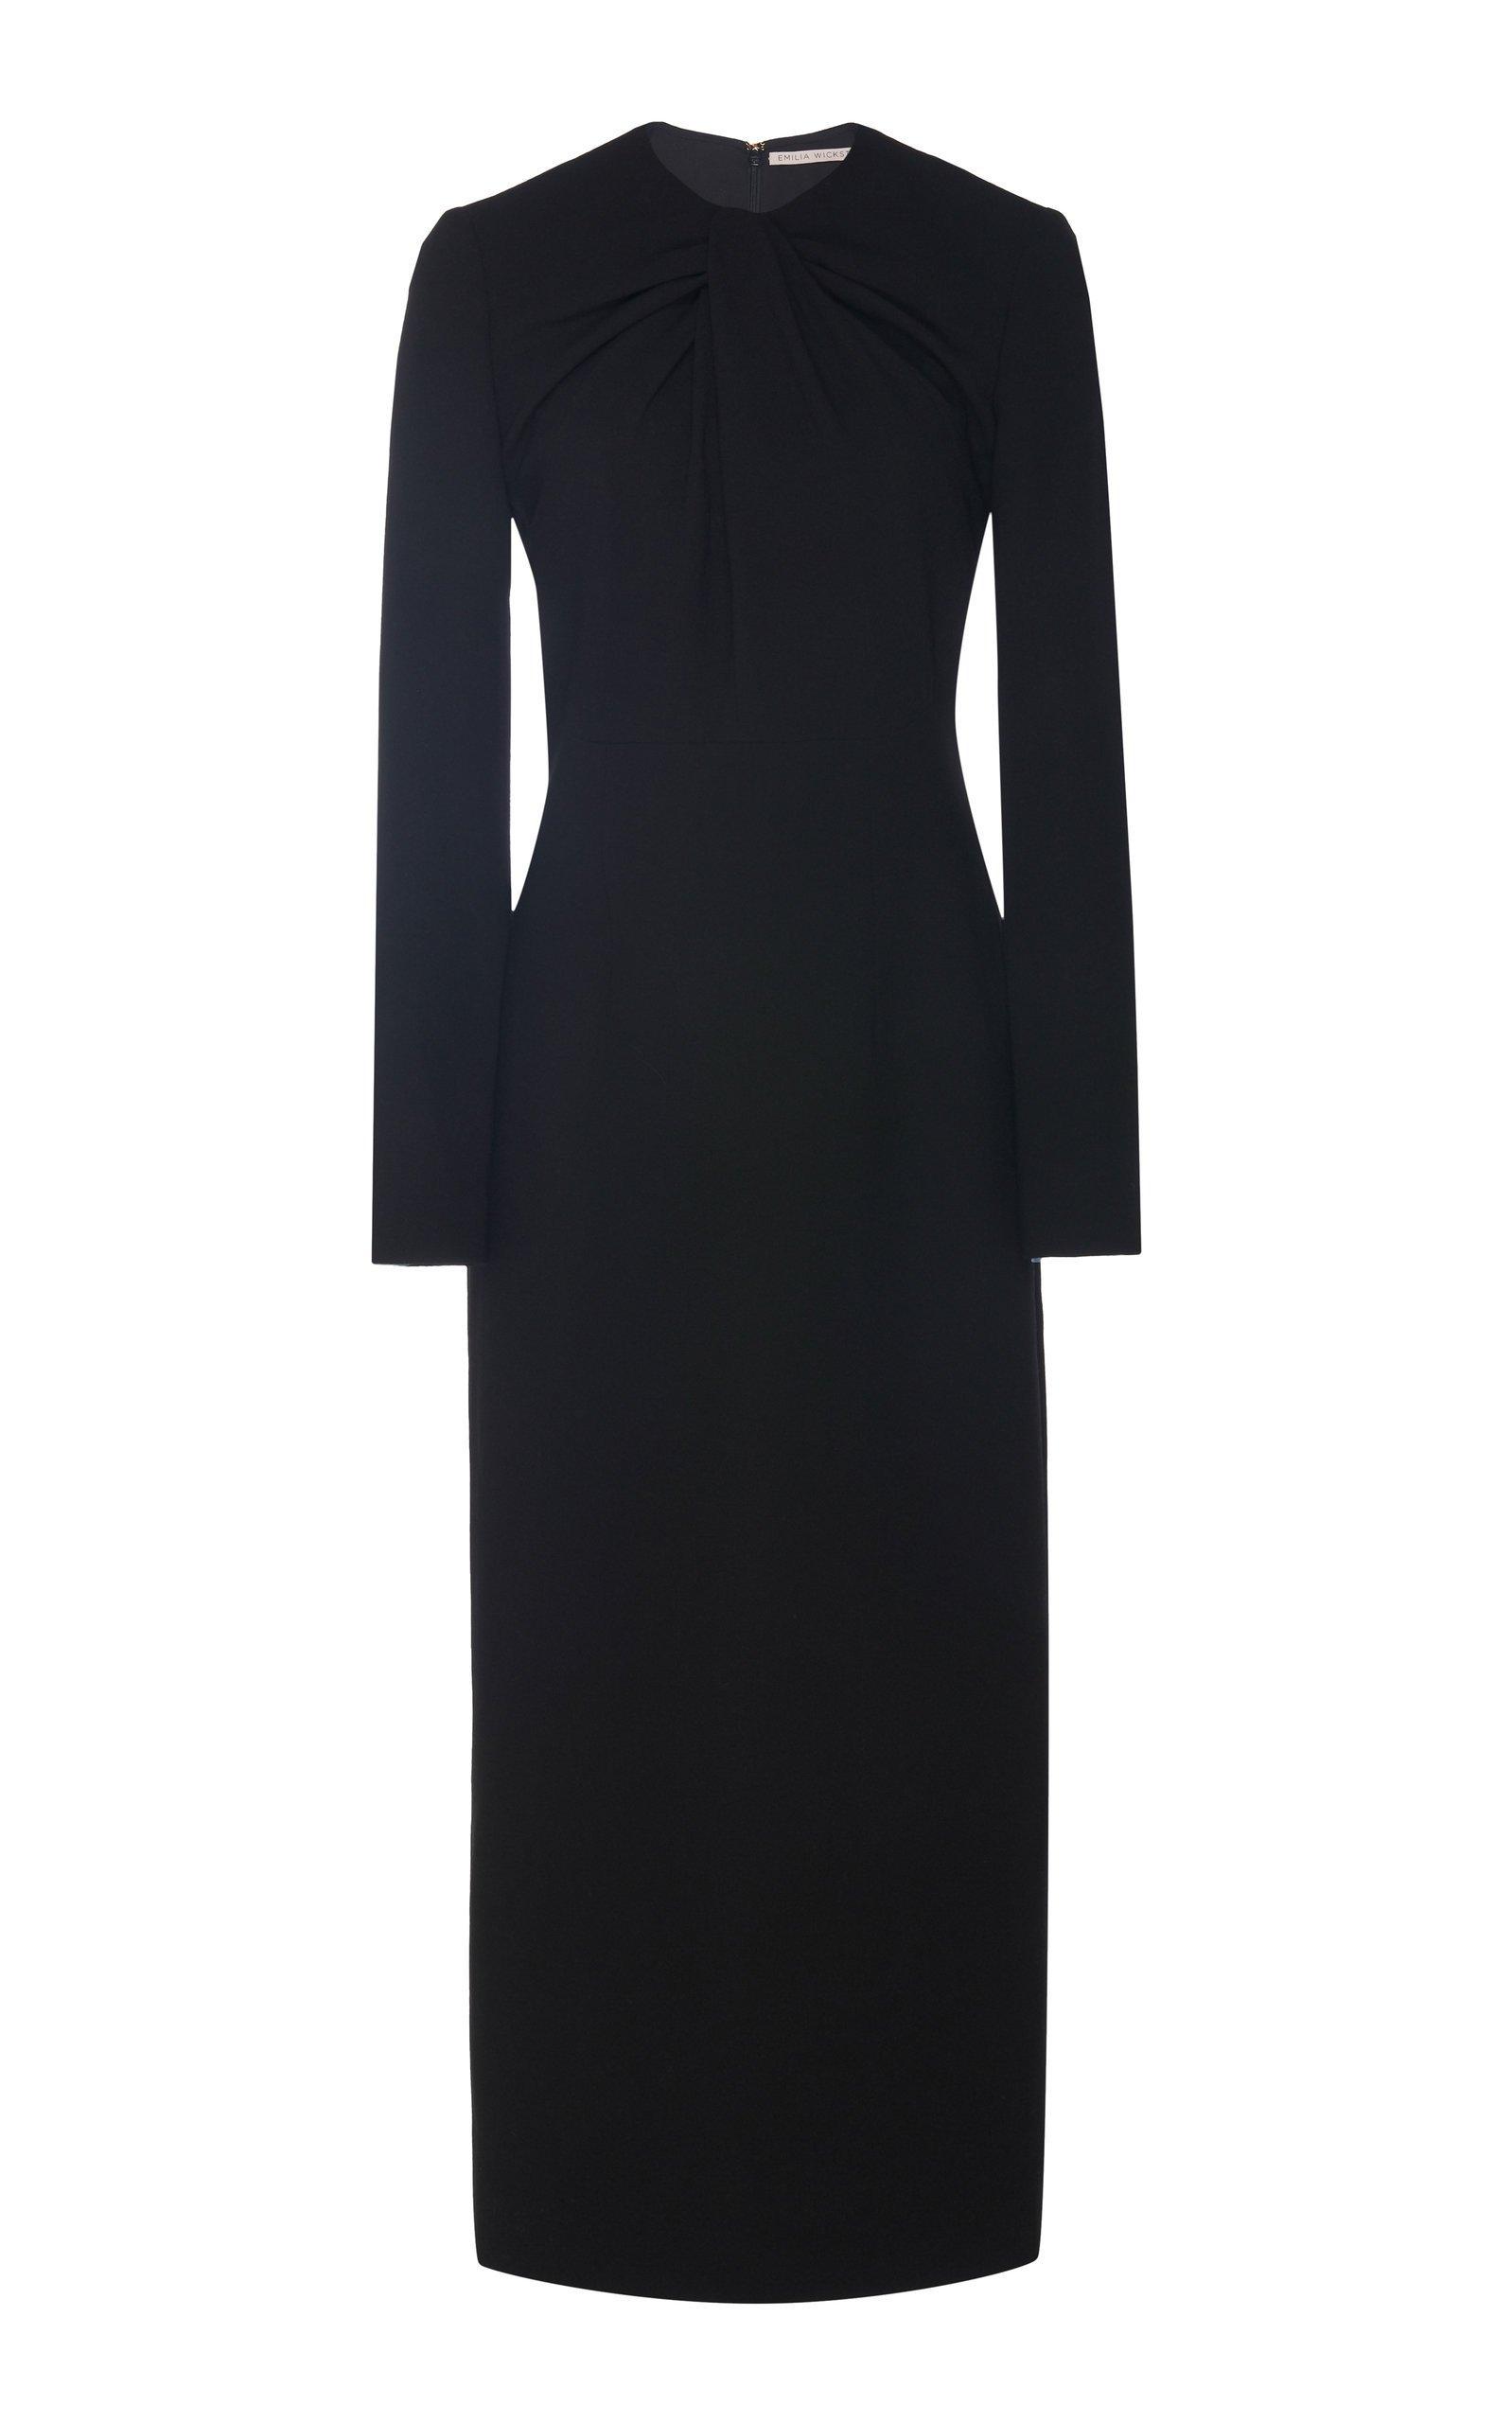 Emilia Wickstead Remy Stretch-Crepe Midi Dress